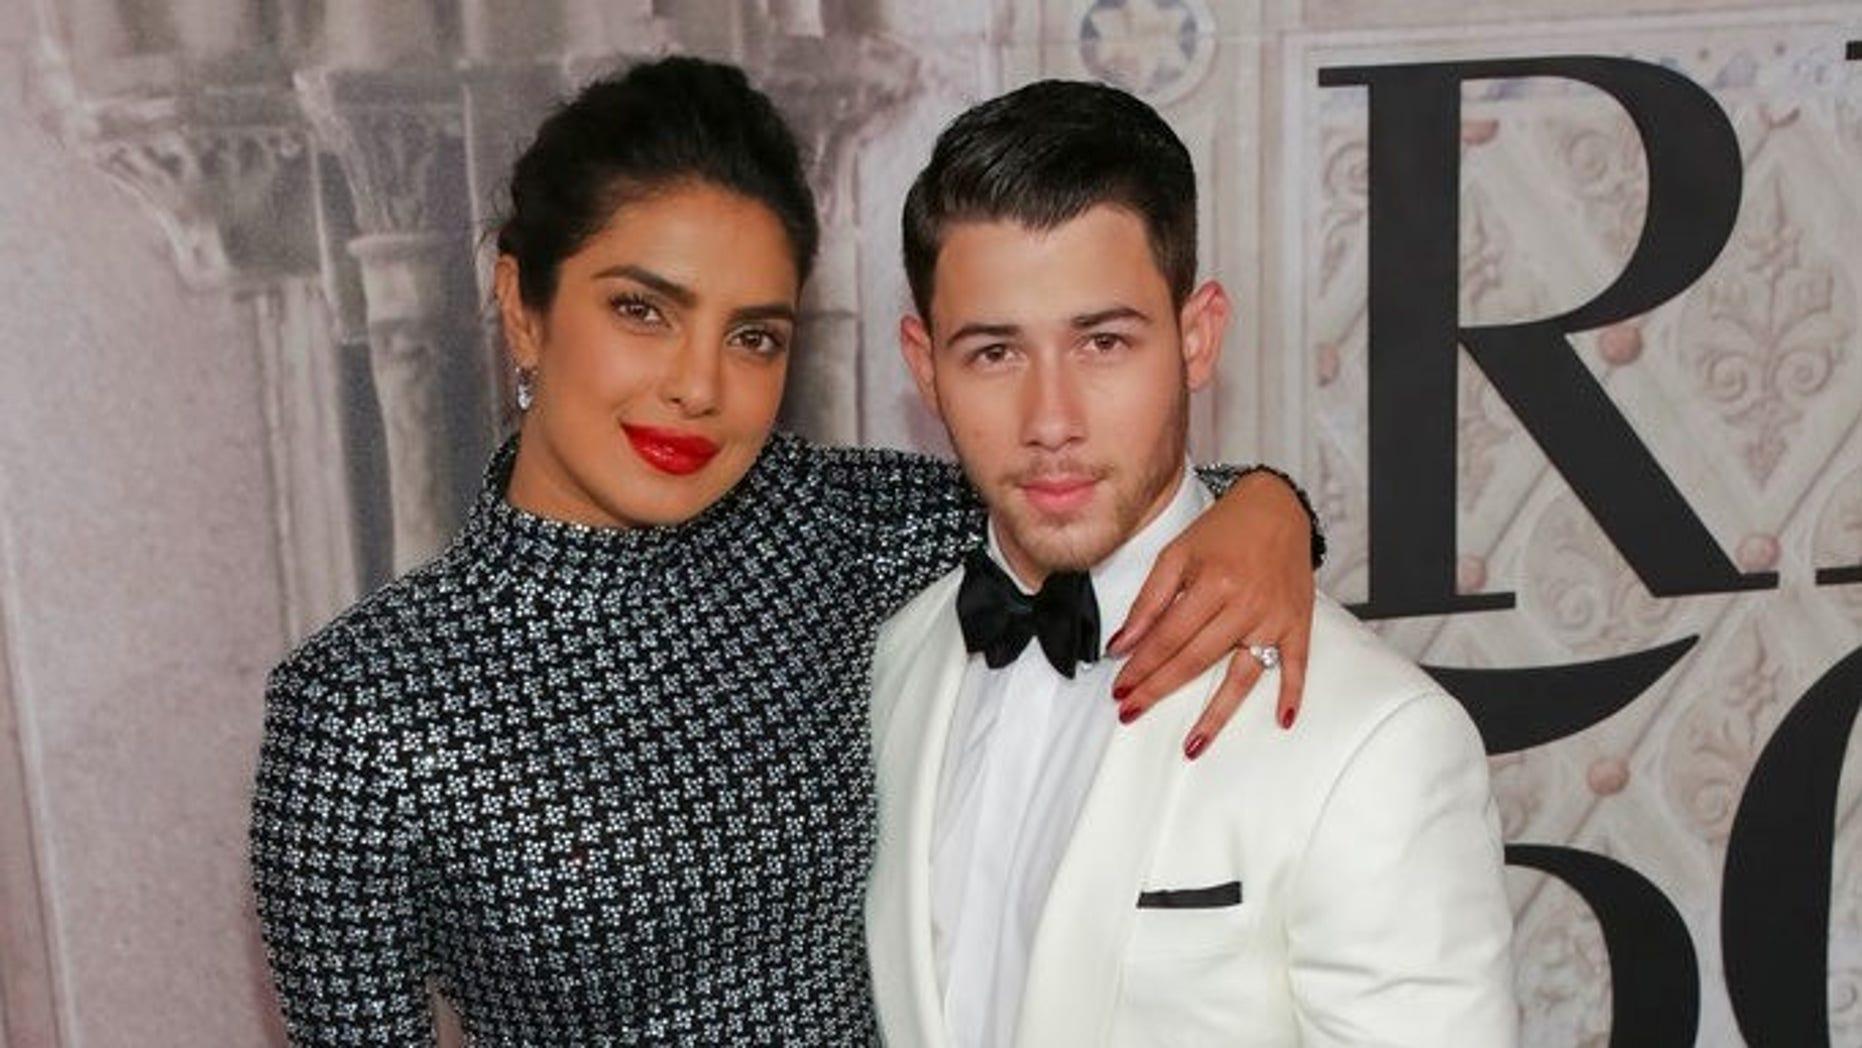 Priyanka Chopra and fiance Nick Jonas recreated pal Meghan Markle and Prince Harry's engagement photo.